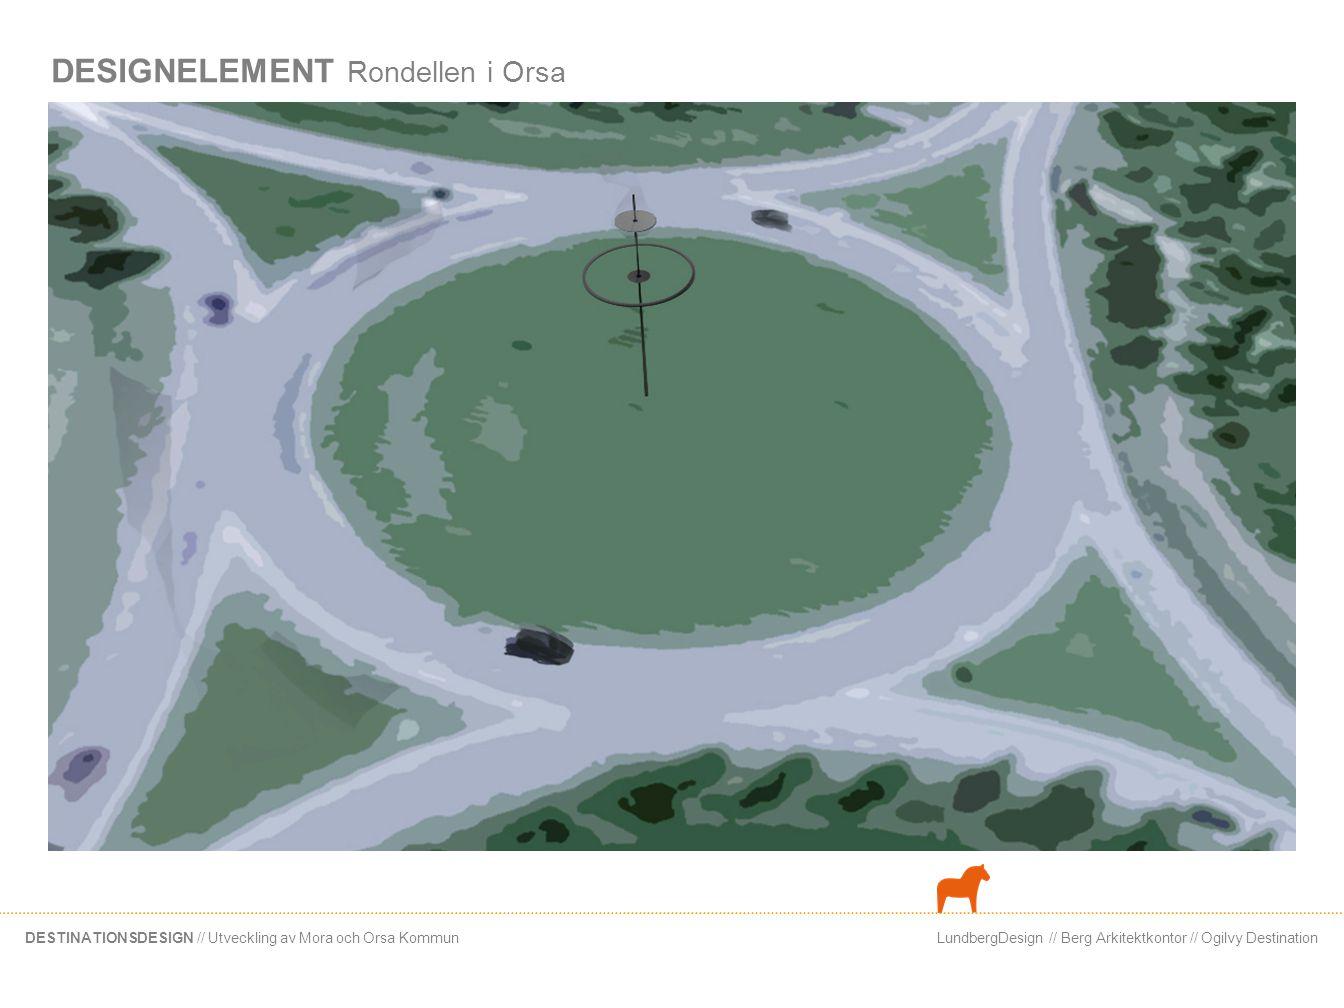 LundbergDesign // Berg Arkitektkontor // Ogilvy DestinationDESTINATIONSDESIGN // Utveckling av Mora och Orsa Kommun DESIGNELEMENT Rondellen i Orsa